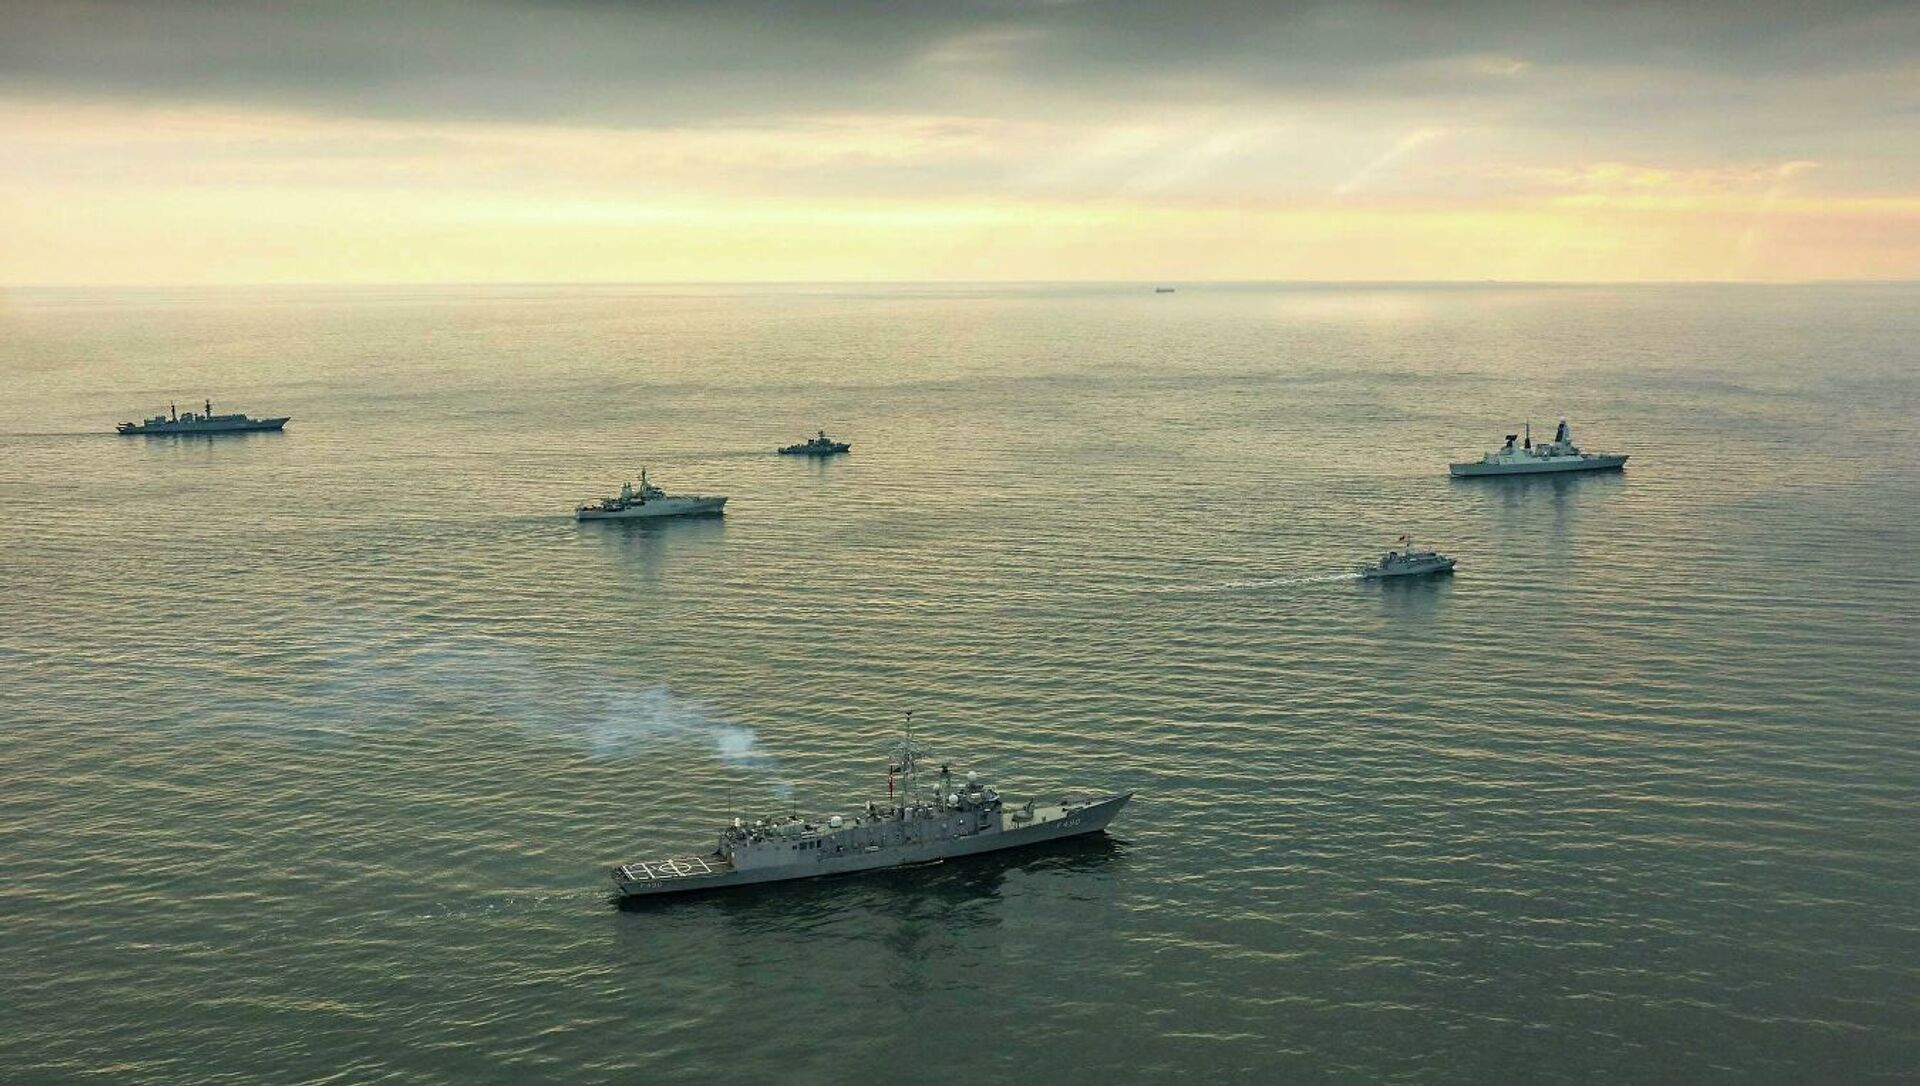 Корабли НАТО в Черном море. Архивное фото - Sputnik Таджикистан, 1920, 11.02.2021